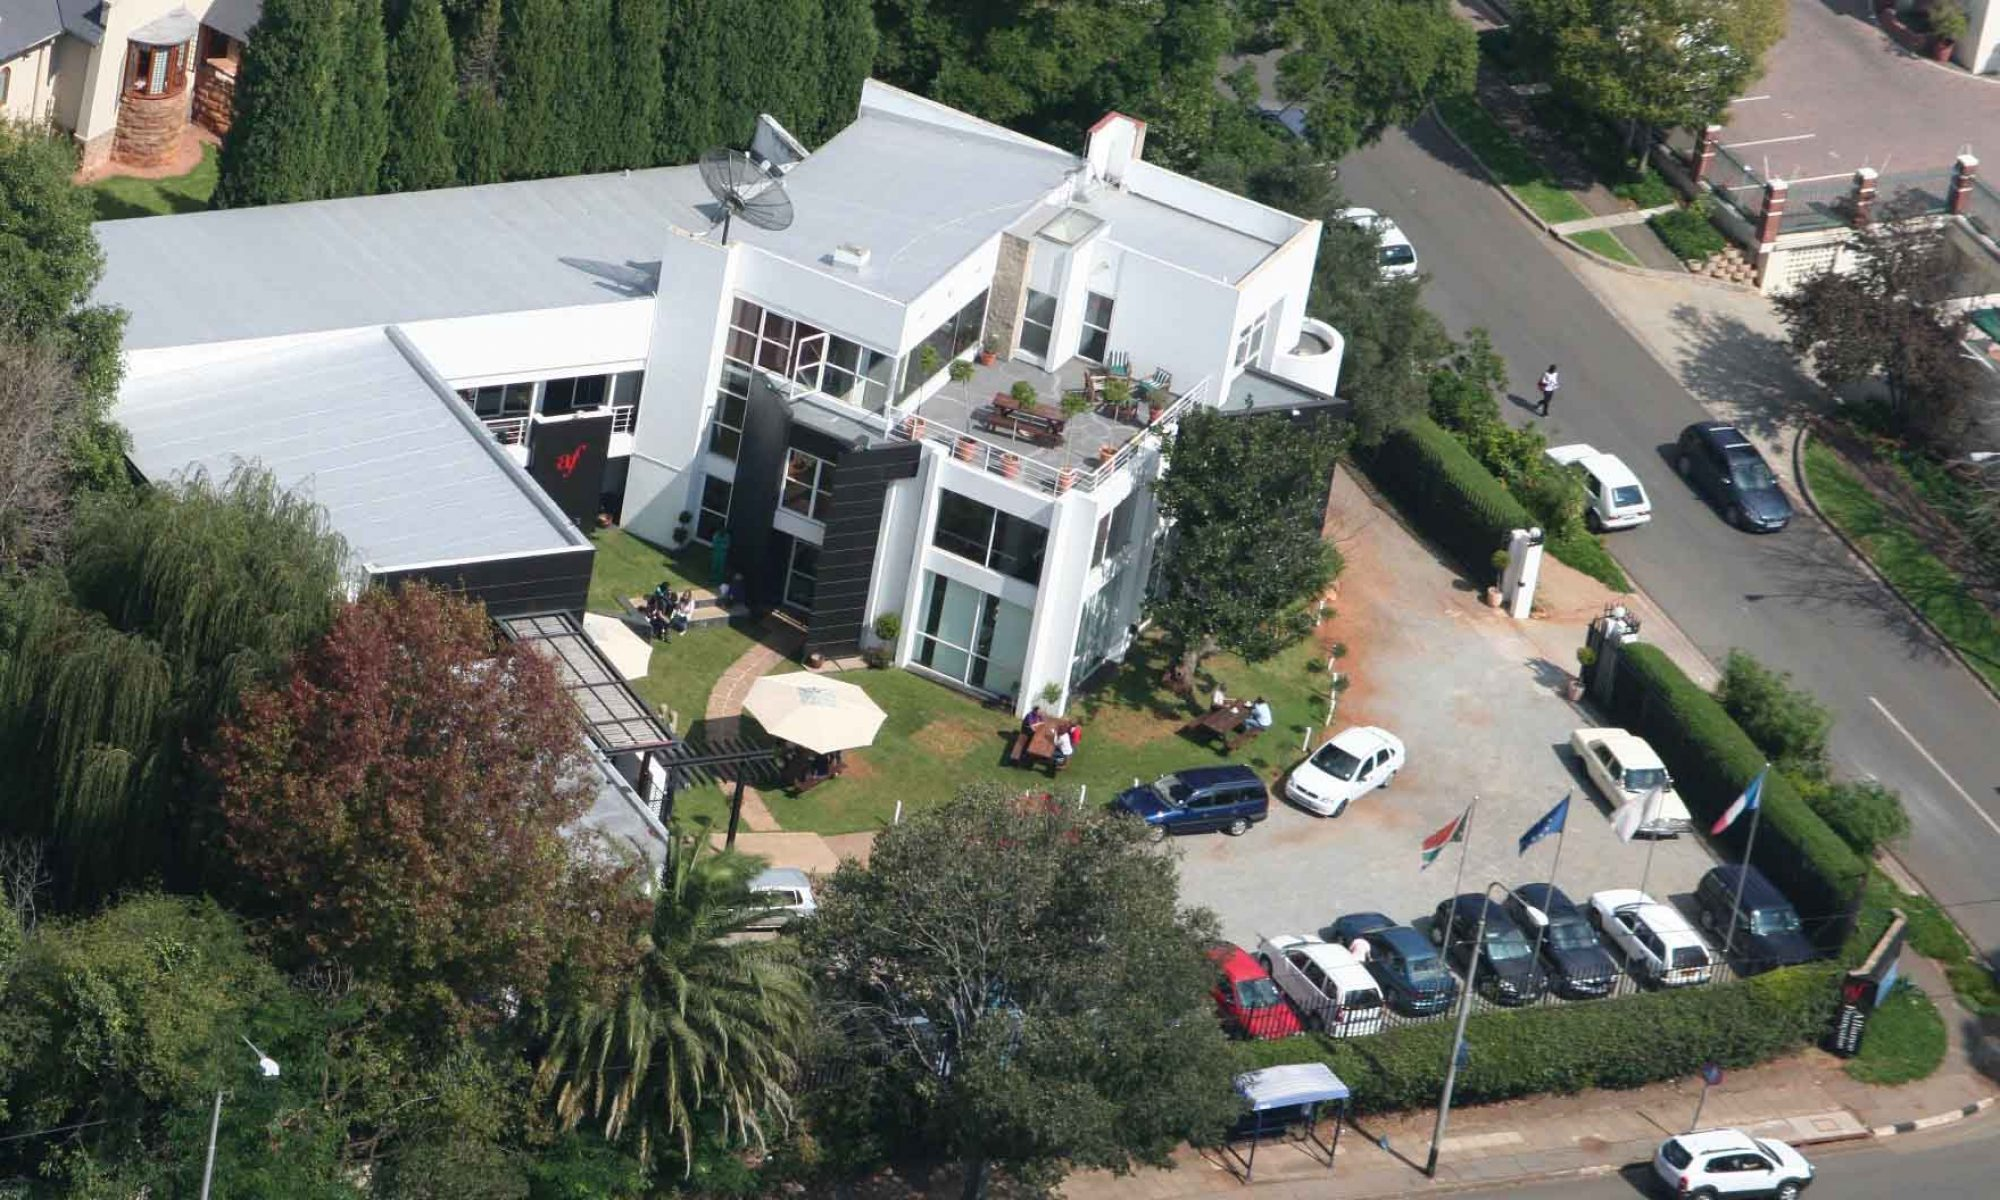 magasin en ligne les ventes chaudes super populaire Alliance Française in Southern Africa – Leading French ...